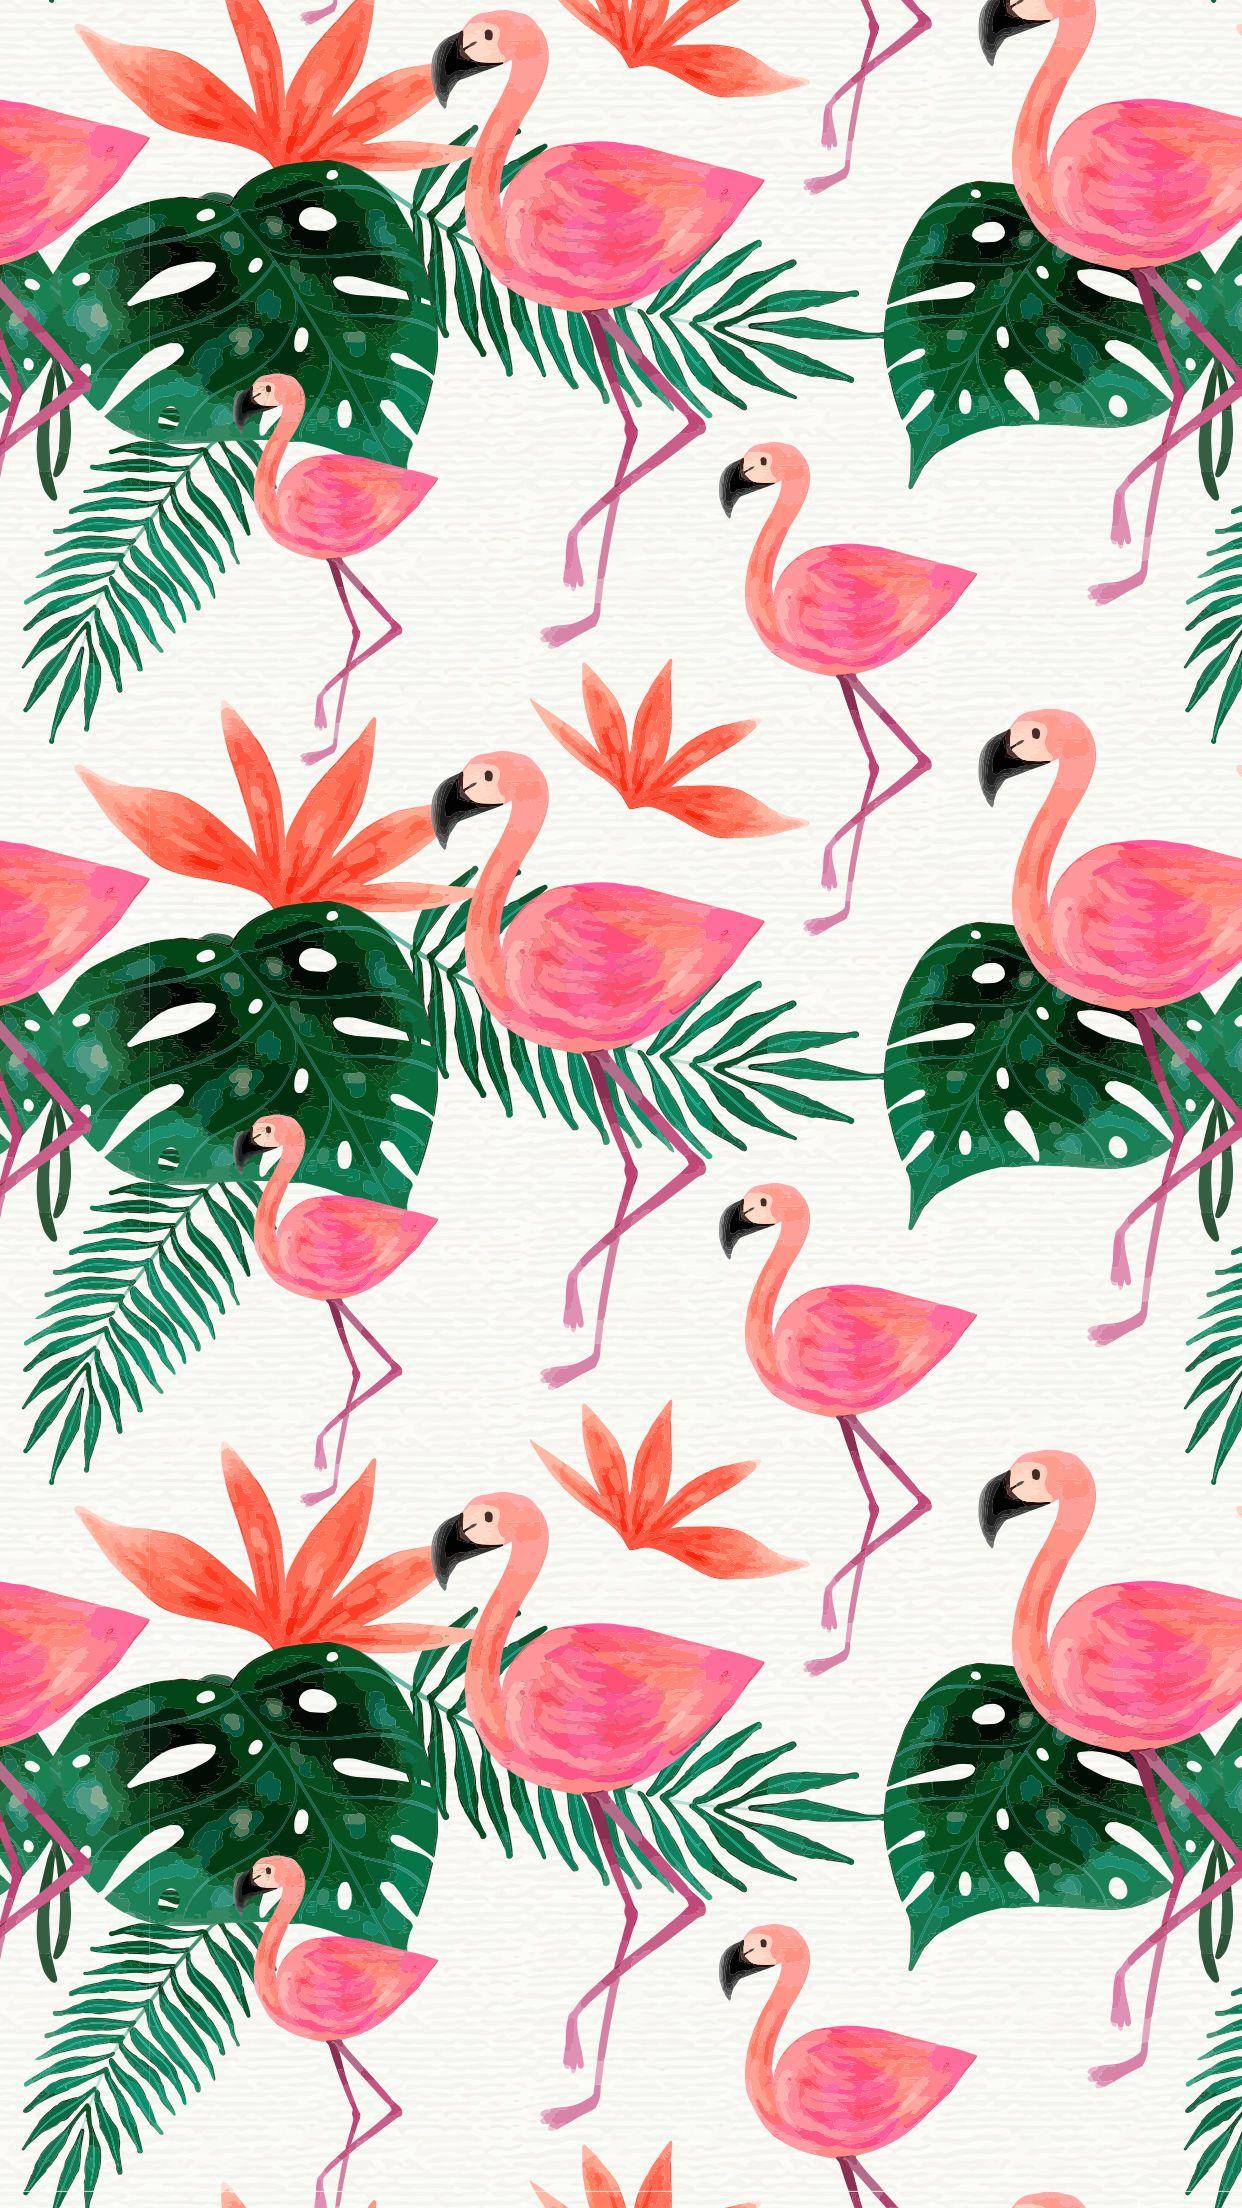 Watercolor Flamingo Cuteness Mobile Wallpaper Tropical Pink Green Pink Wallpaper Backgrounds Flamingo Wallpaper Watercolor Wallpaper